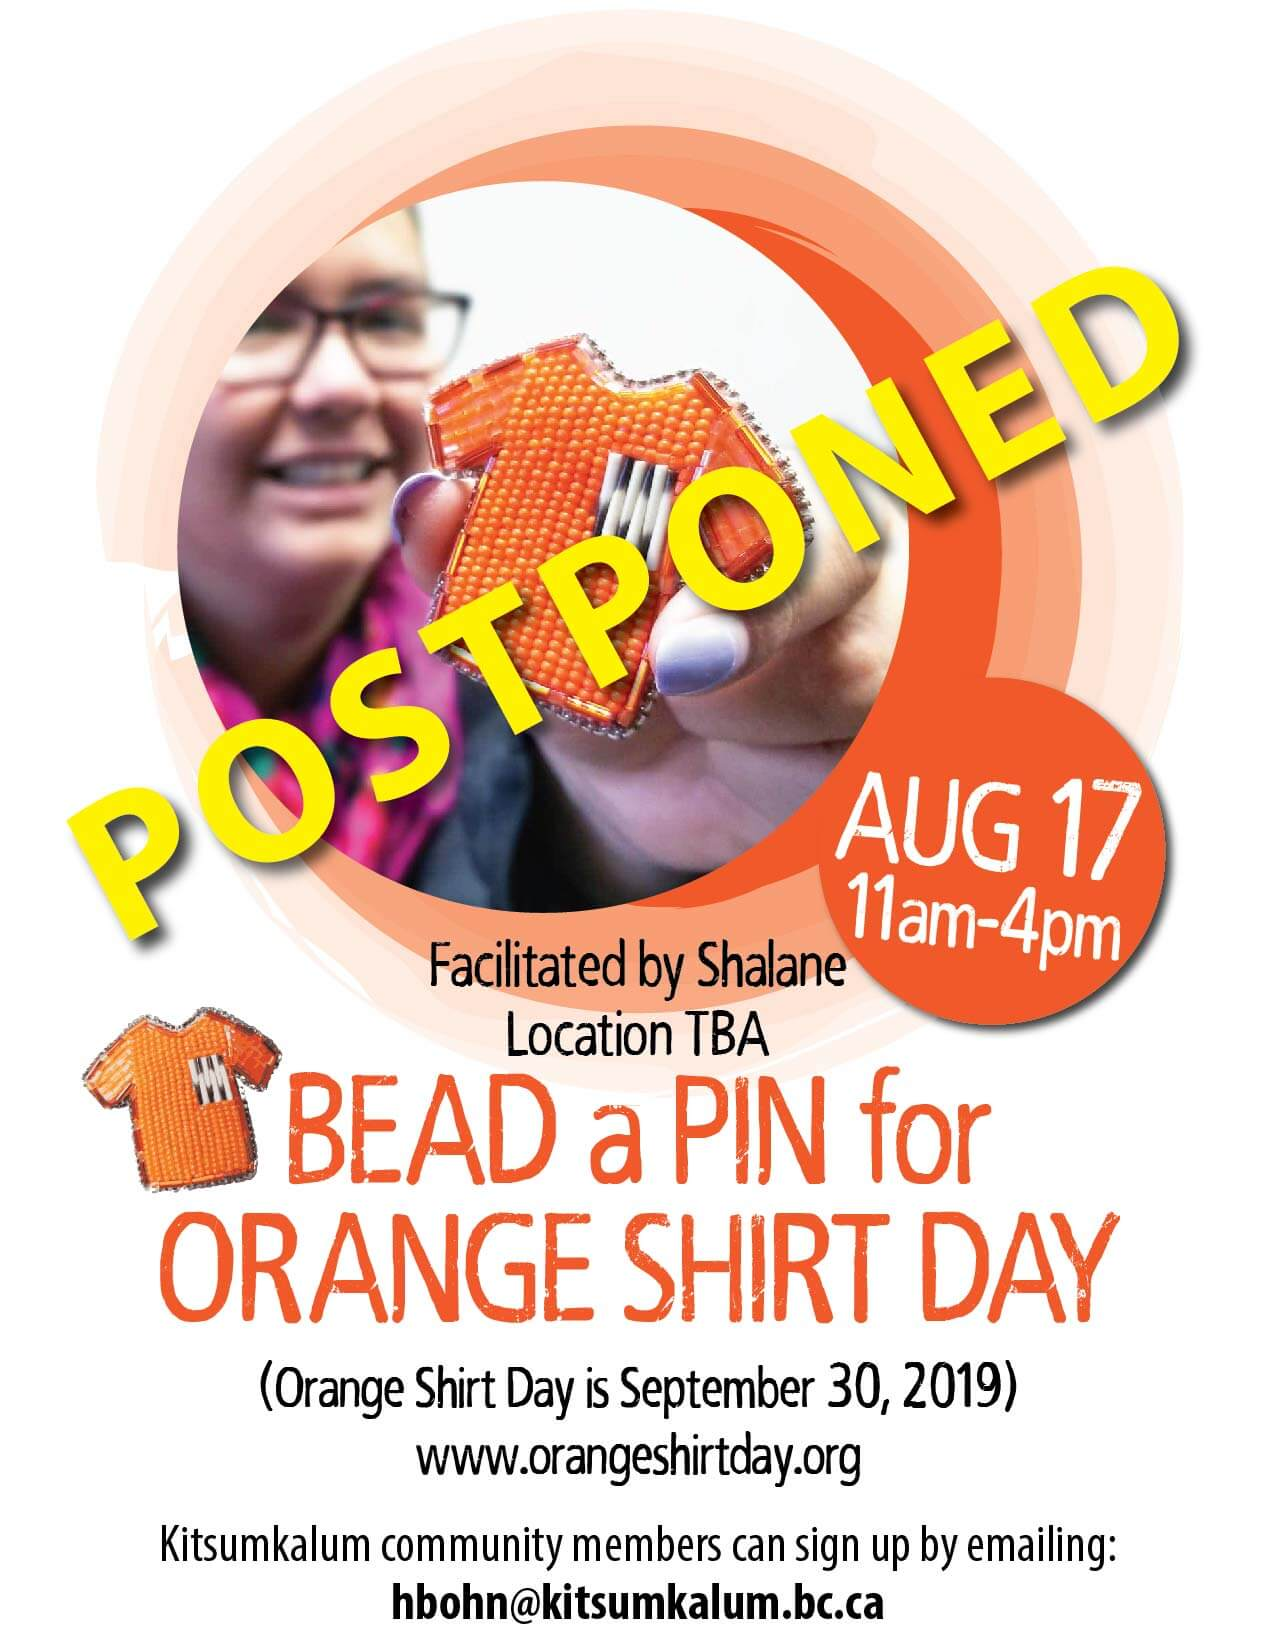 POSTPONED AUG 17 Bead a Pin for Orange Shirt Day